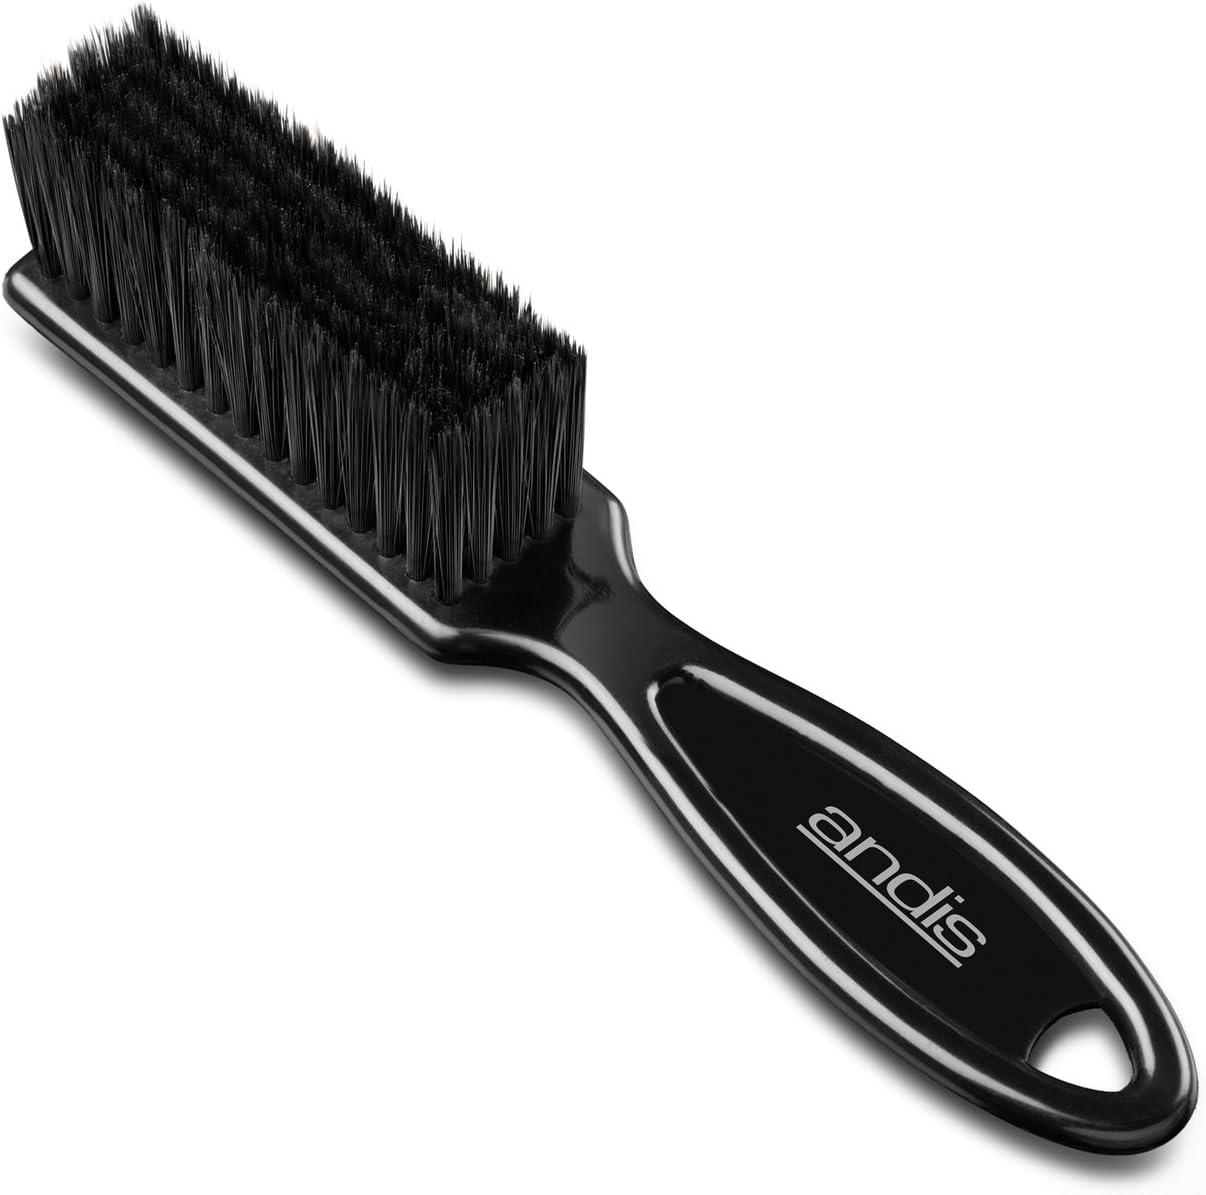 Andis Cepillo para Limpiar Cuchillas 80 g